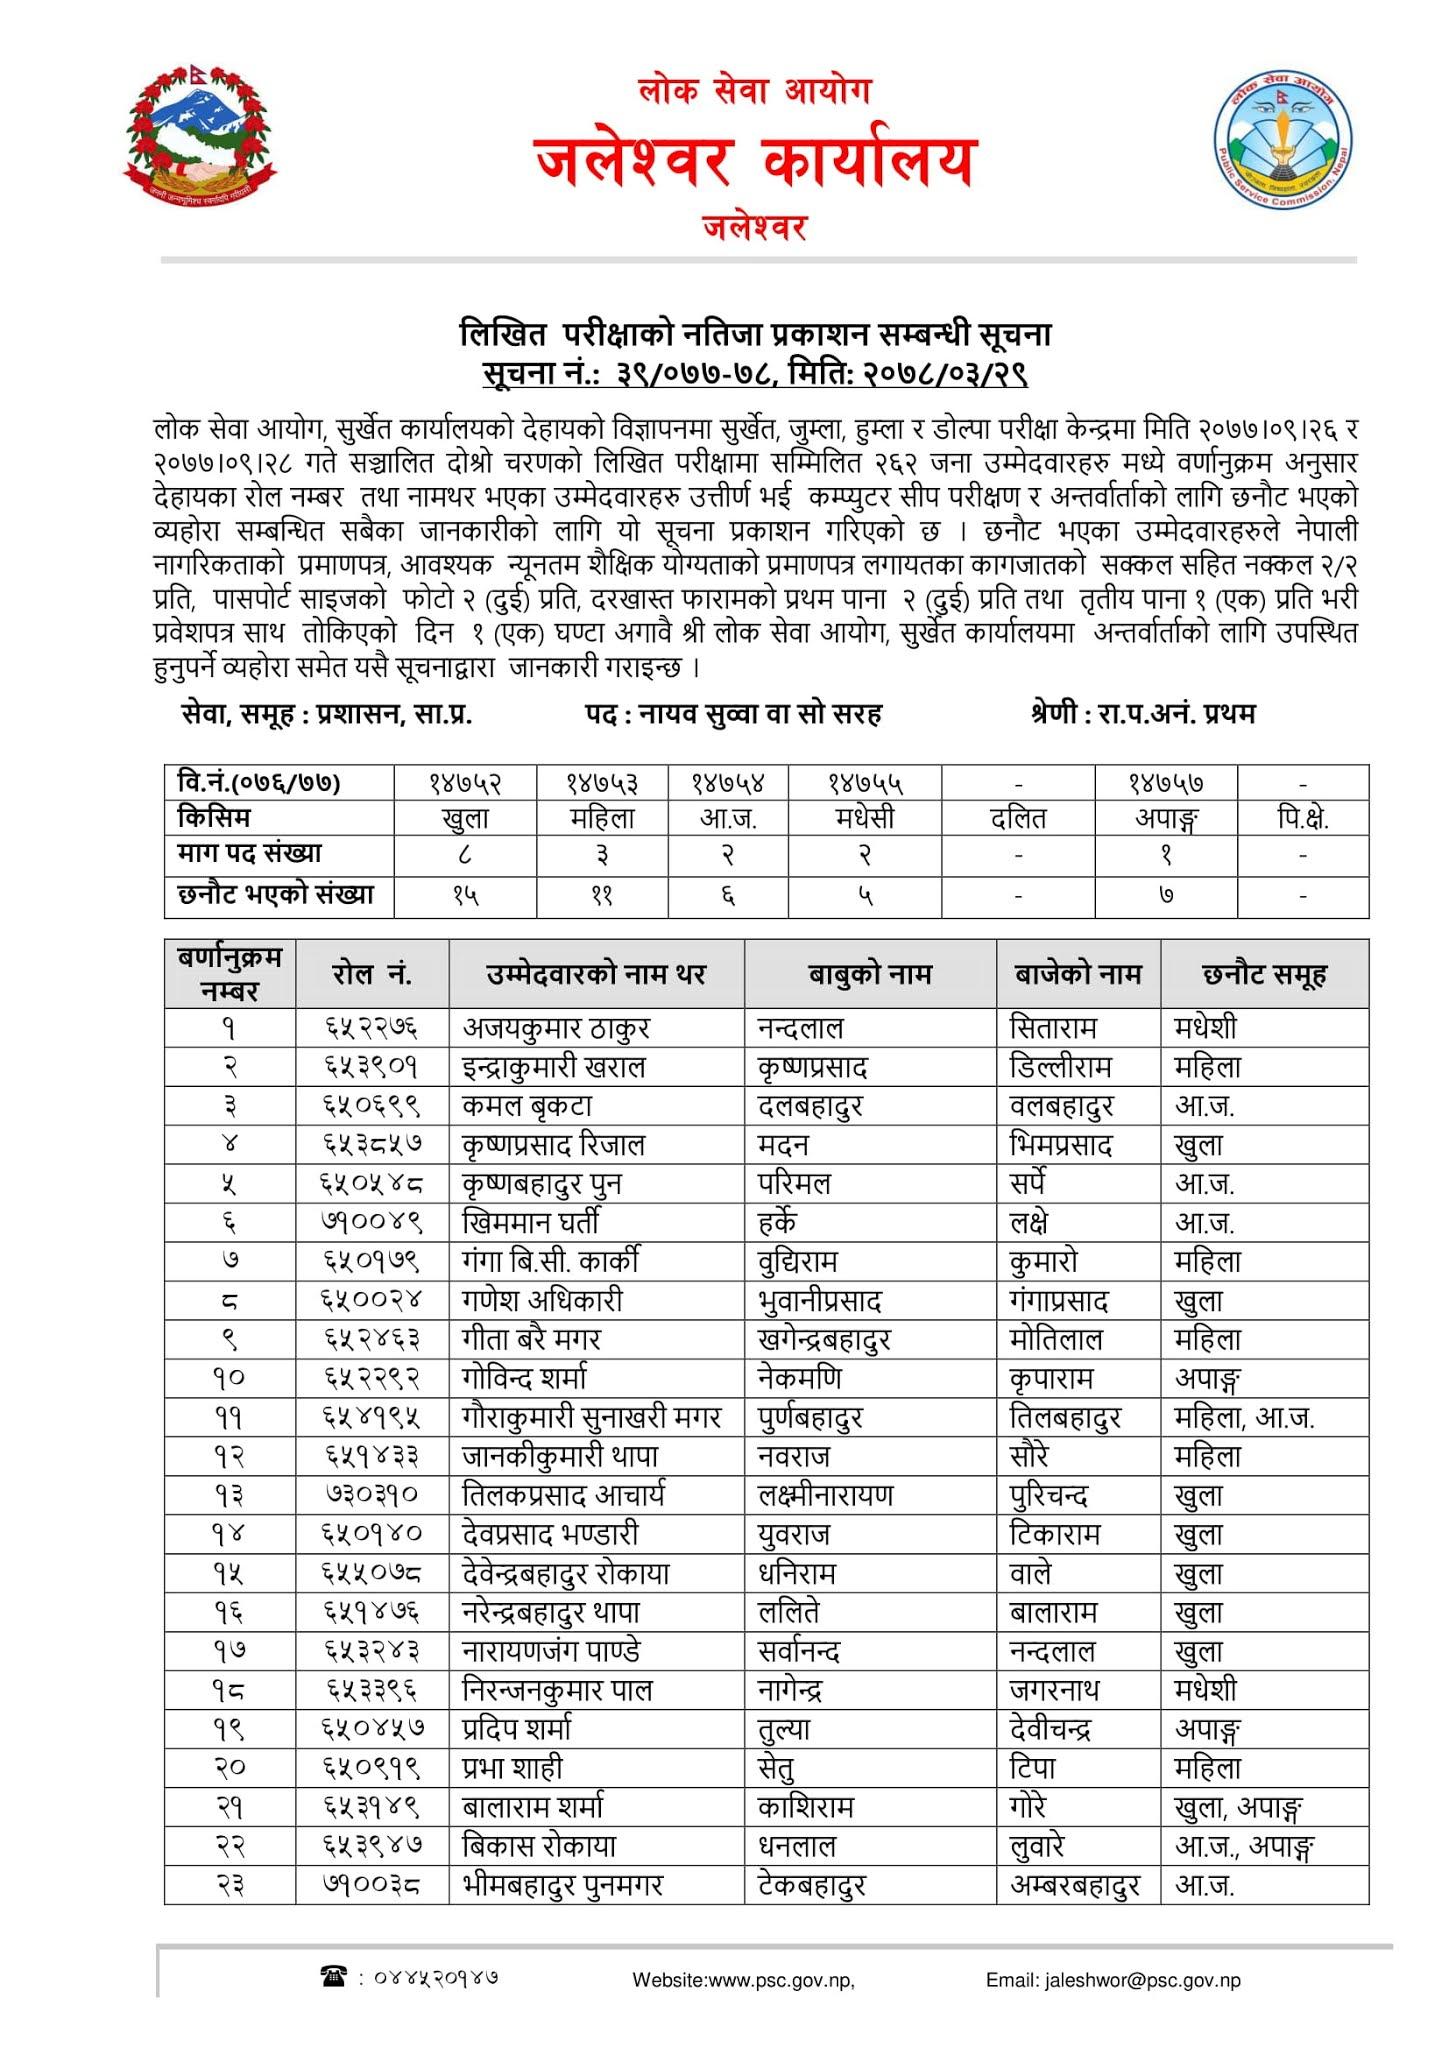 Lok Sewa Aayog Written Exam Result & Exam Schedule for NASU Admin, Jaleshwor